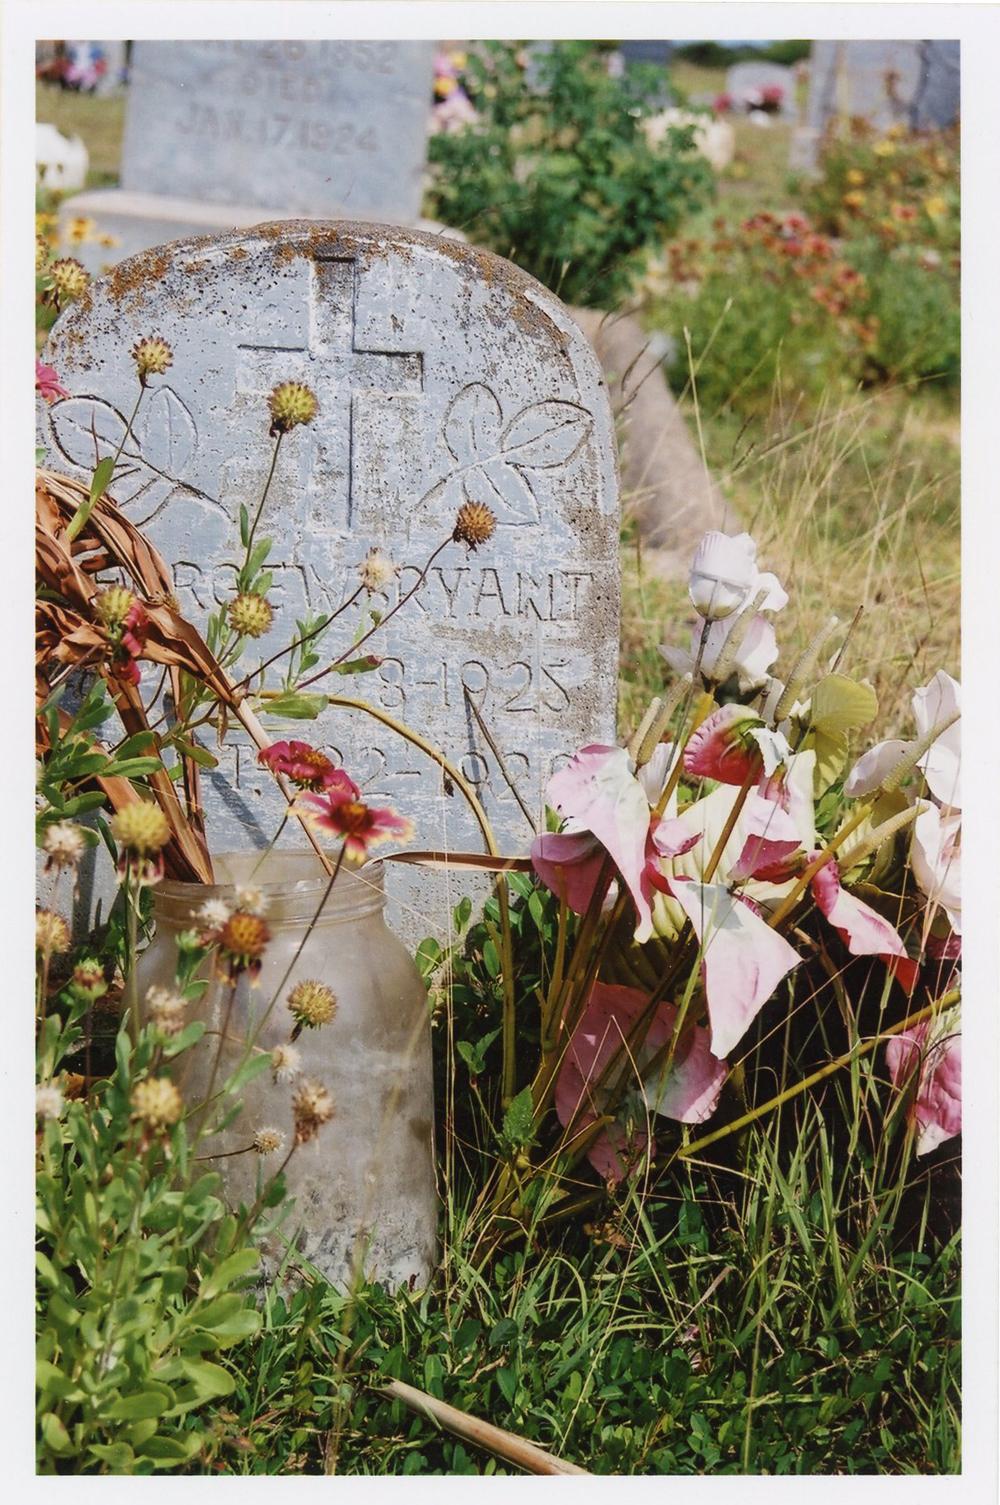 Grave, 2003